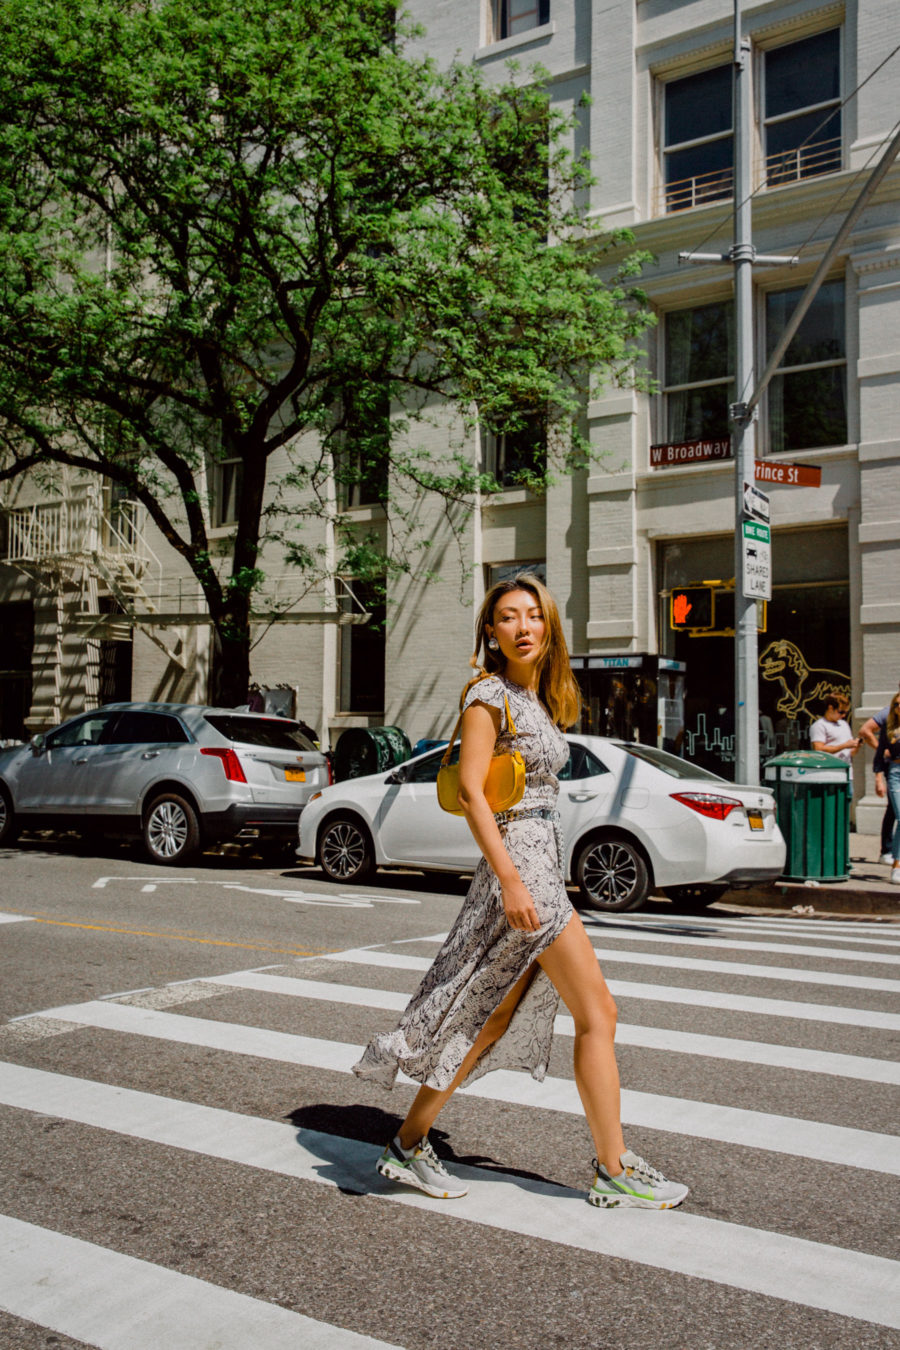 jessica wang vacation outfits with a zebra print dress and nike sneakers // Jessica Wang - Notjessfashion.com